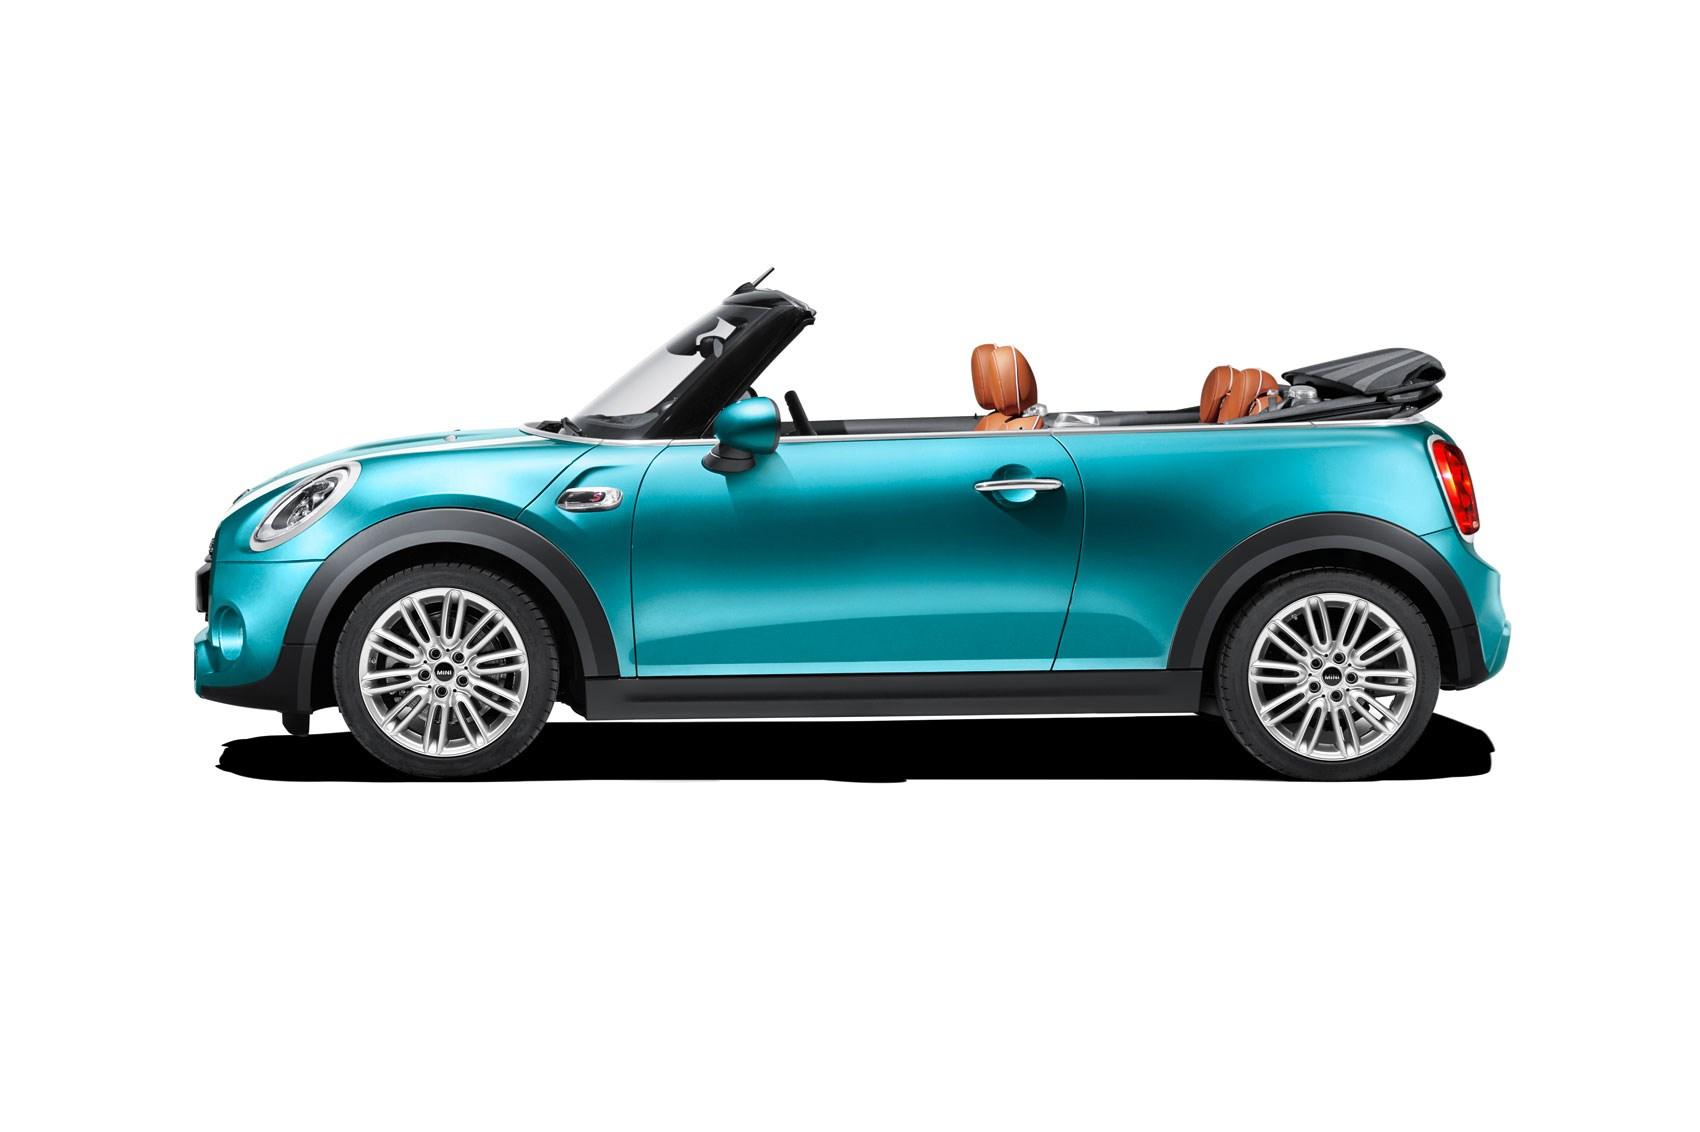 mini declares open season 2016 mini convertible revealed by car magazine. Black Bedroom Furniture Sets. Home Design Ideas